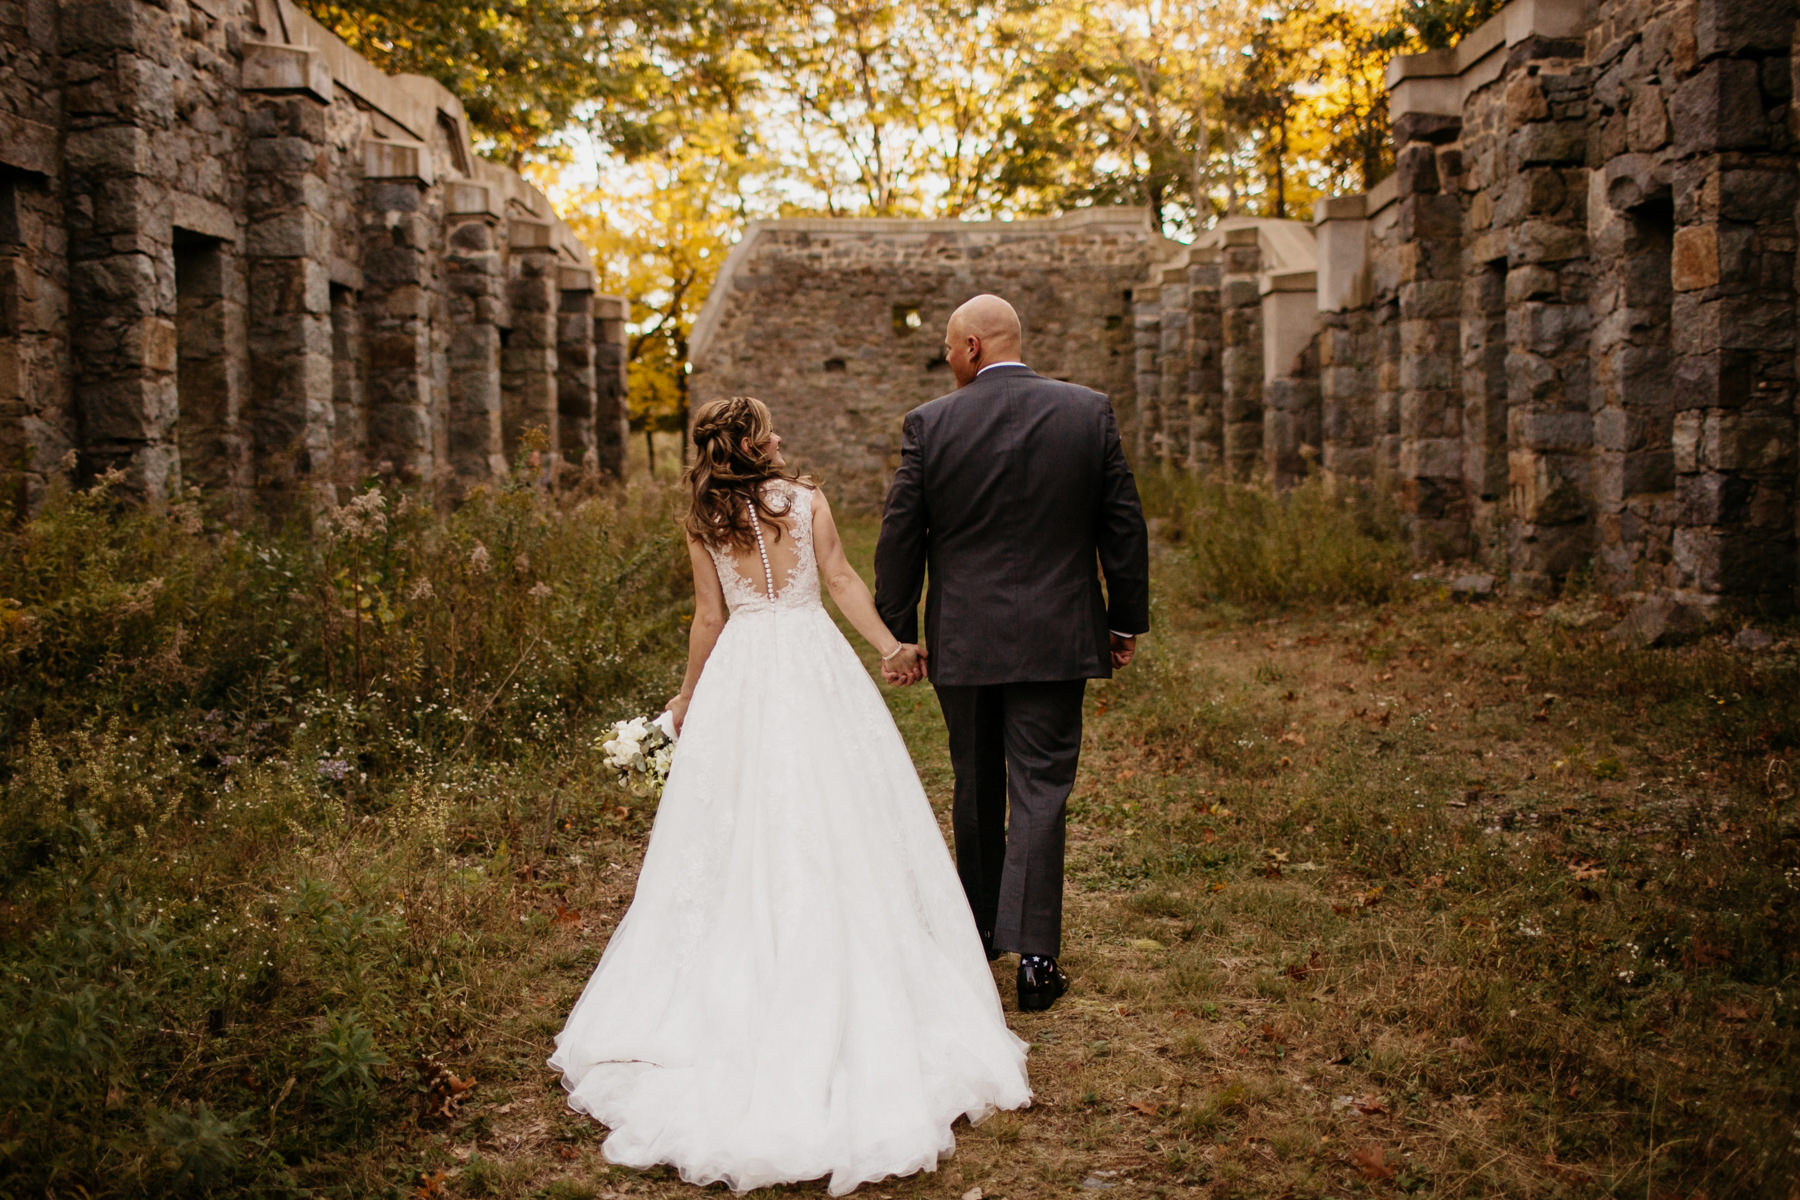 Quincy Ma Massachusetts Wedding Dedham Boston Granie Links Wedding New England Catholic Cathedral Liz Osban Photography 78.jpg